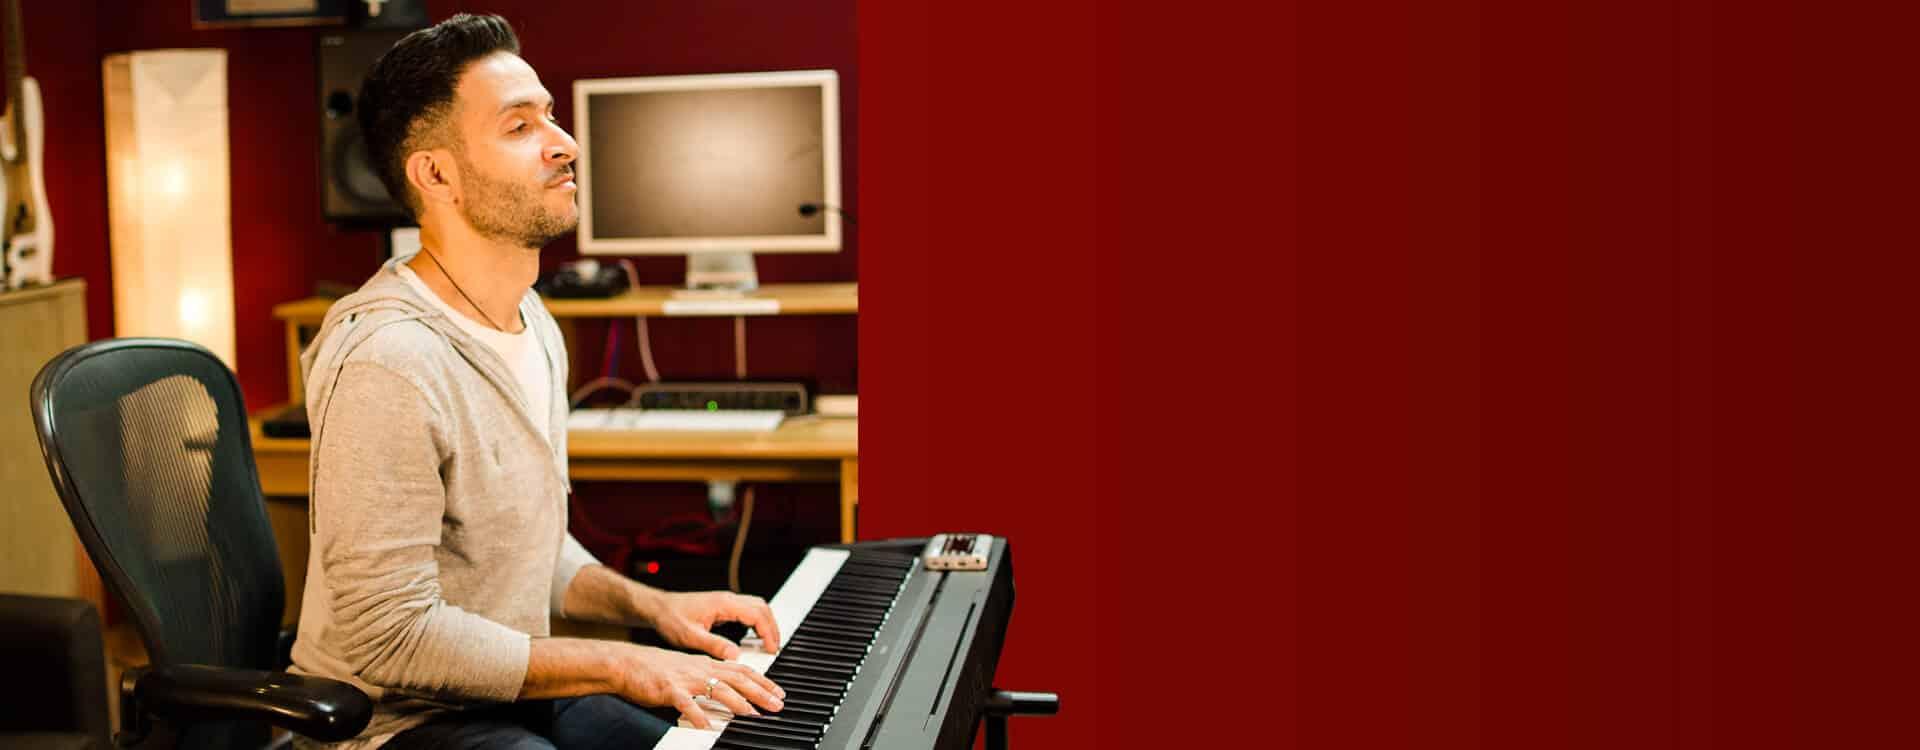 Vocal Coach London - Singing Teacher London | Sonic Crew